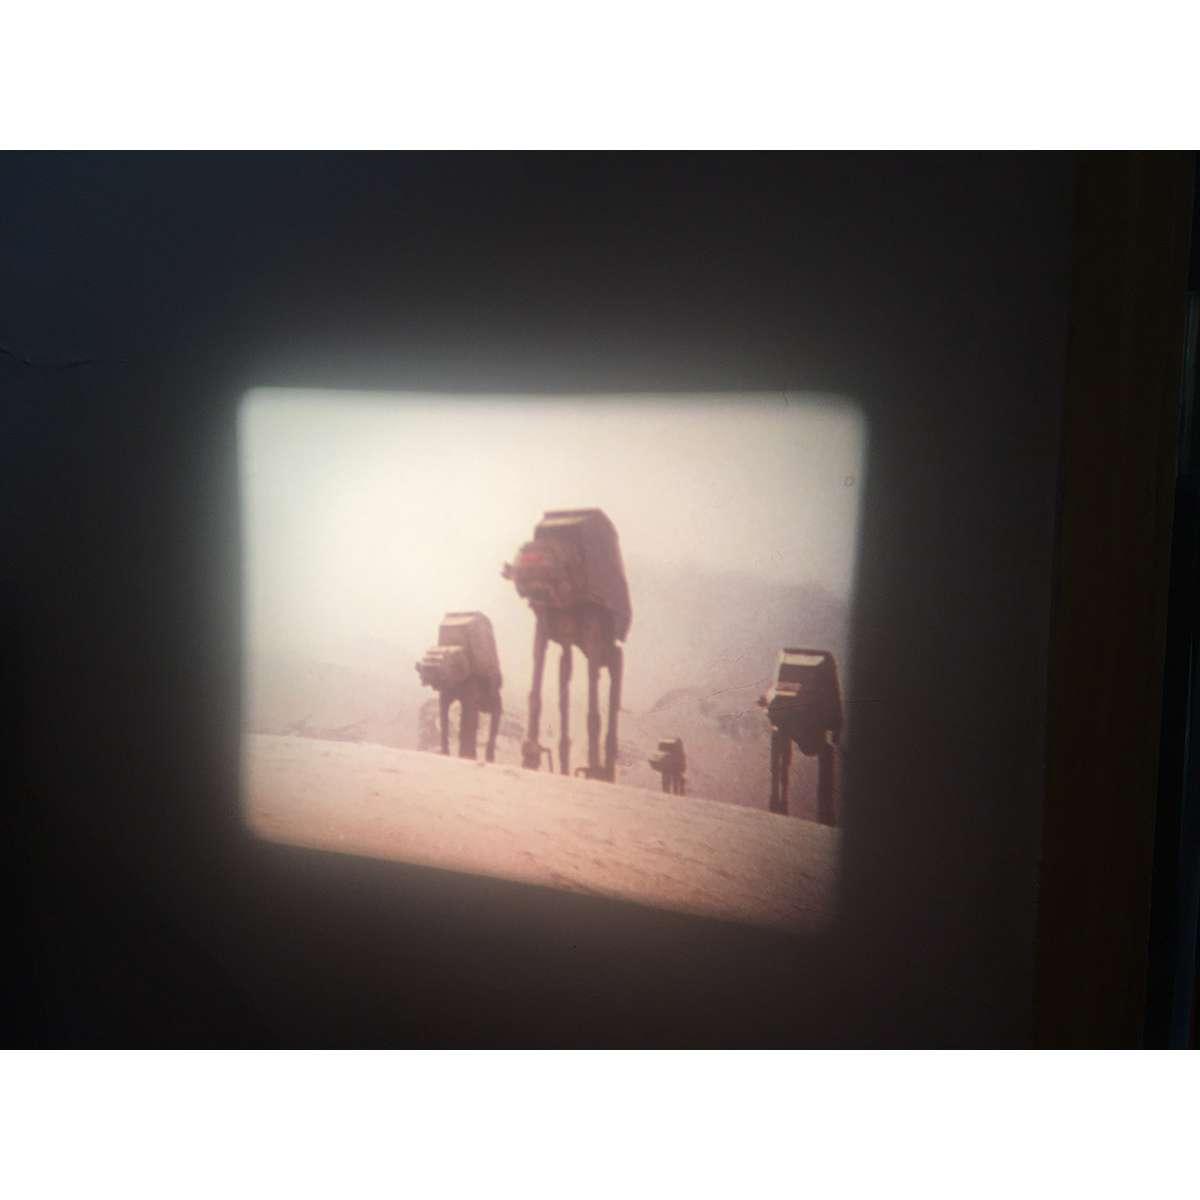 STAR WARS - EMPIRE STRIKES BACK 16mm Movie 2x2 in